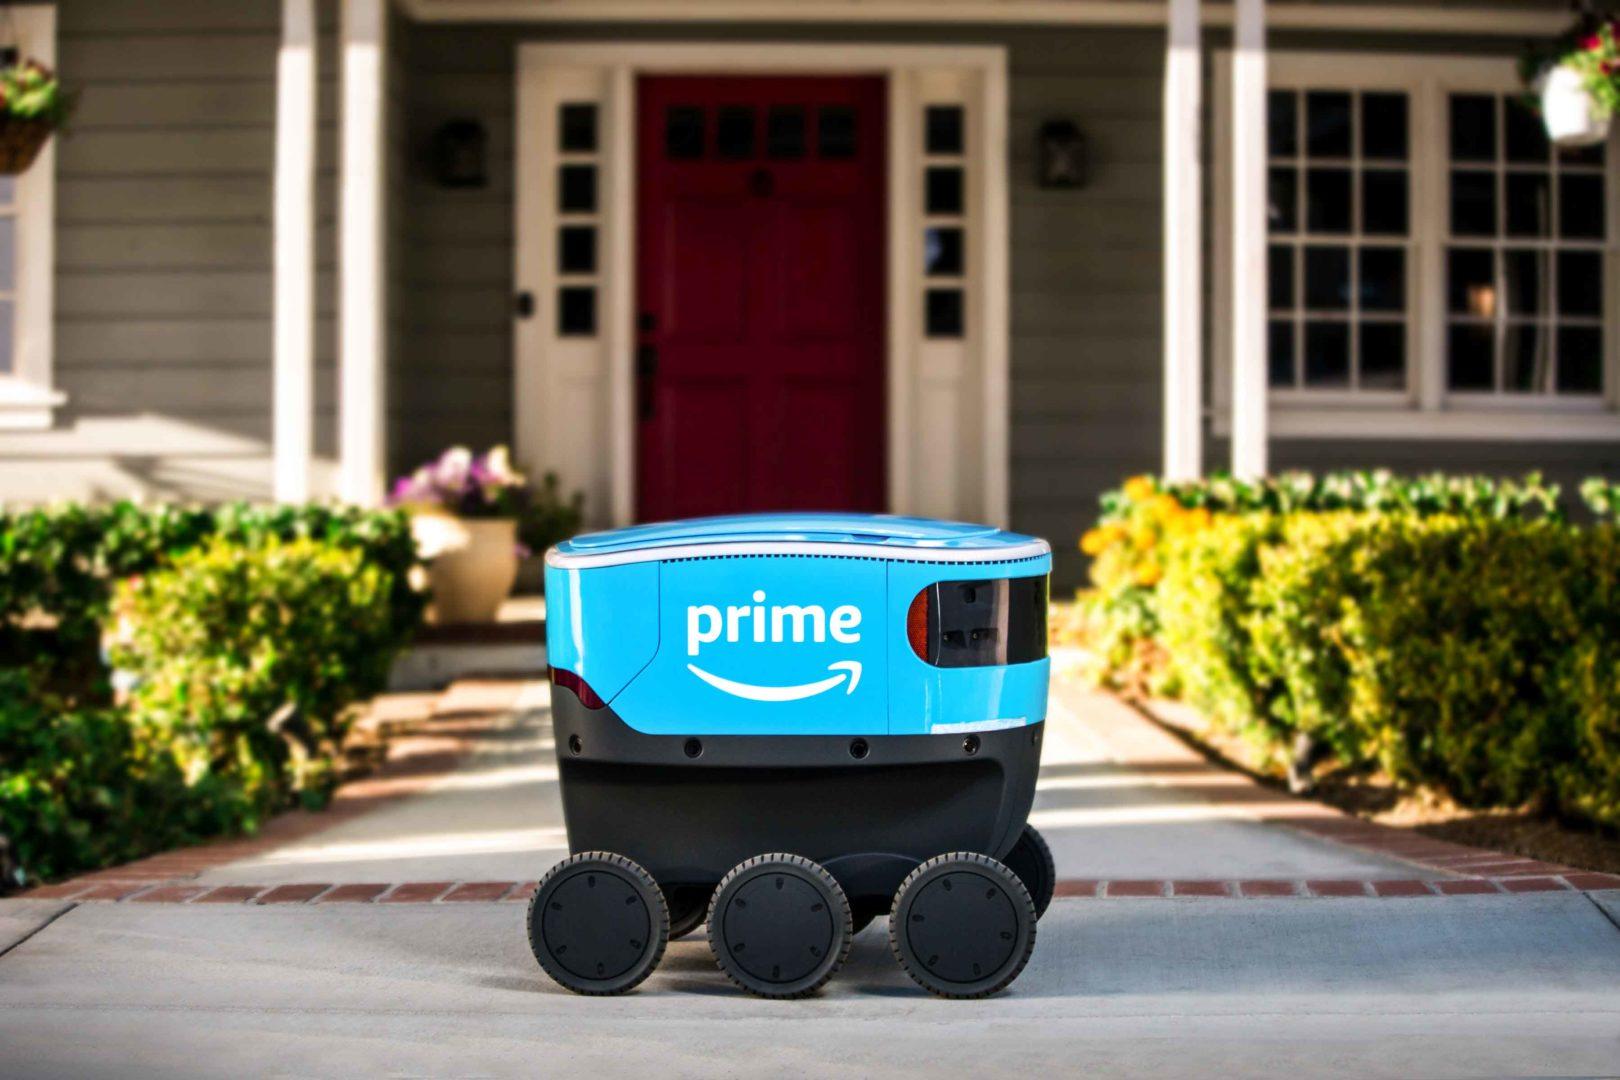 Amazon release scout for autonomous delivery service By Amazon